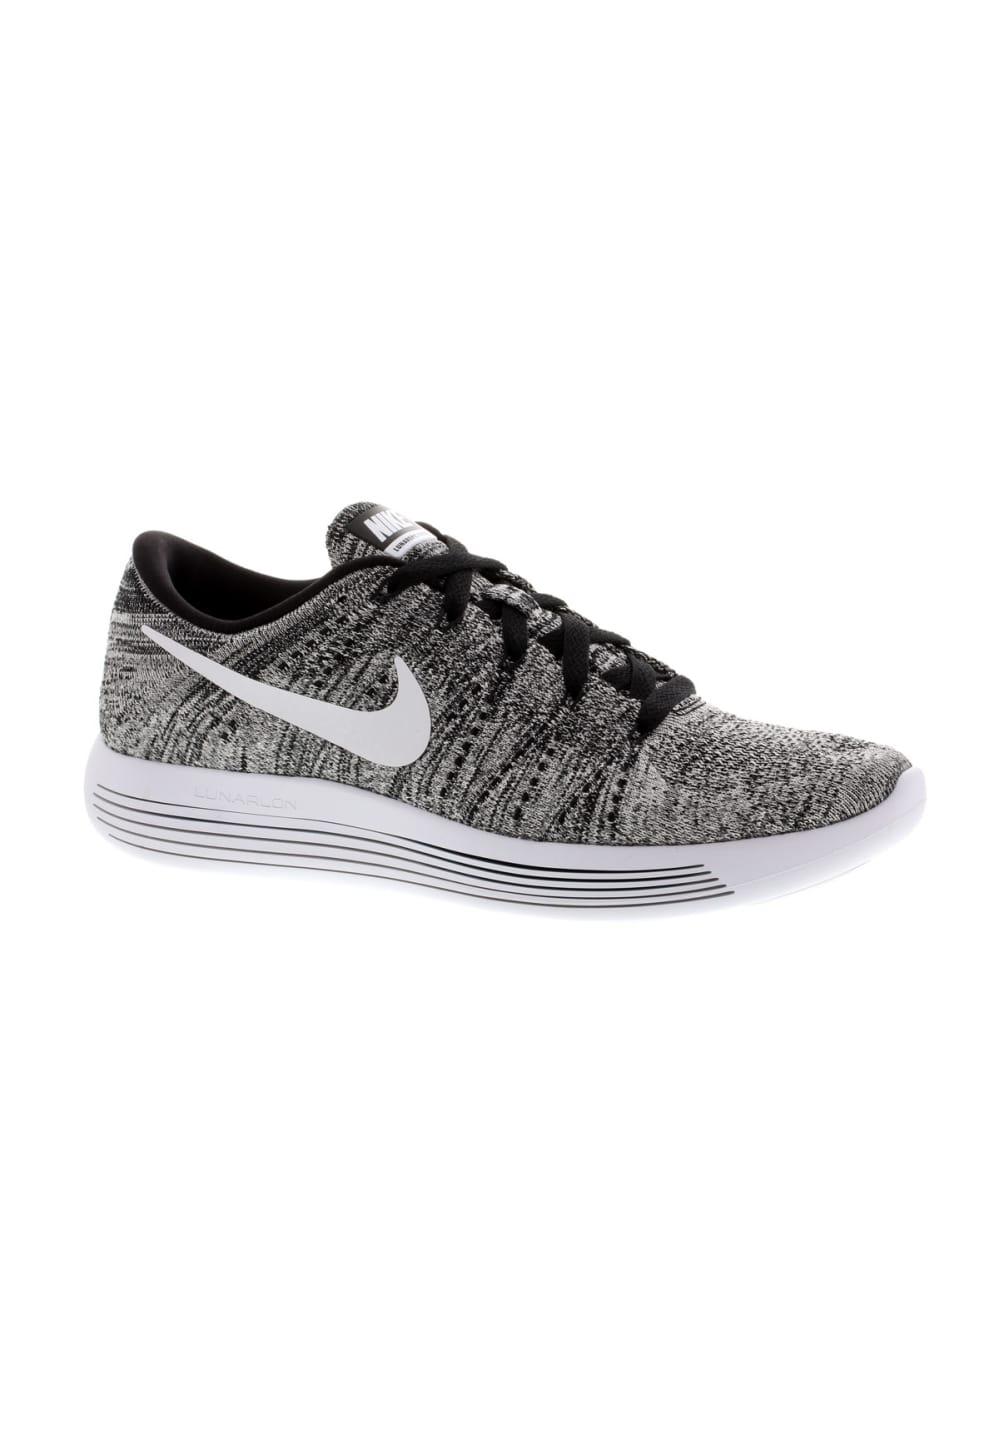 sale retailer e97c1 f3ac0 Nike Lunarepic Low Flyknit - Running shoes for Women - Grey